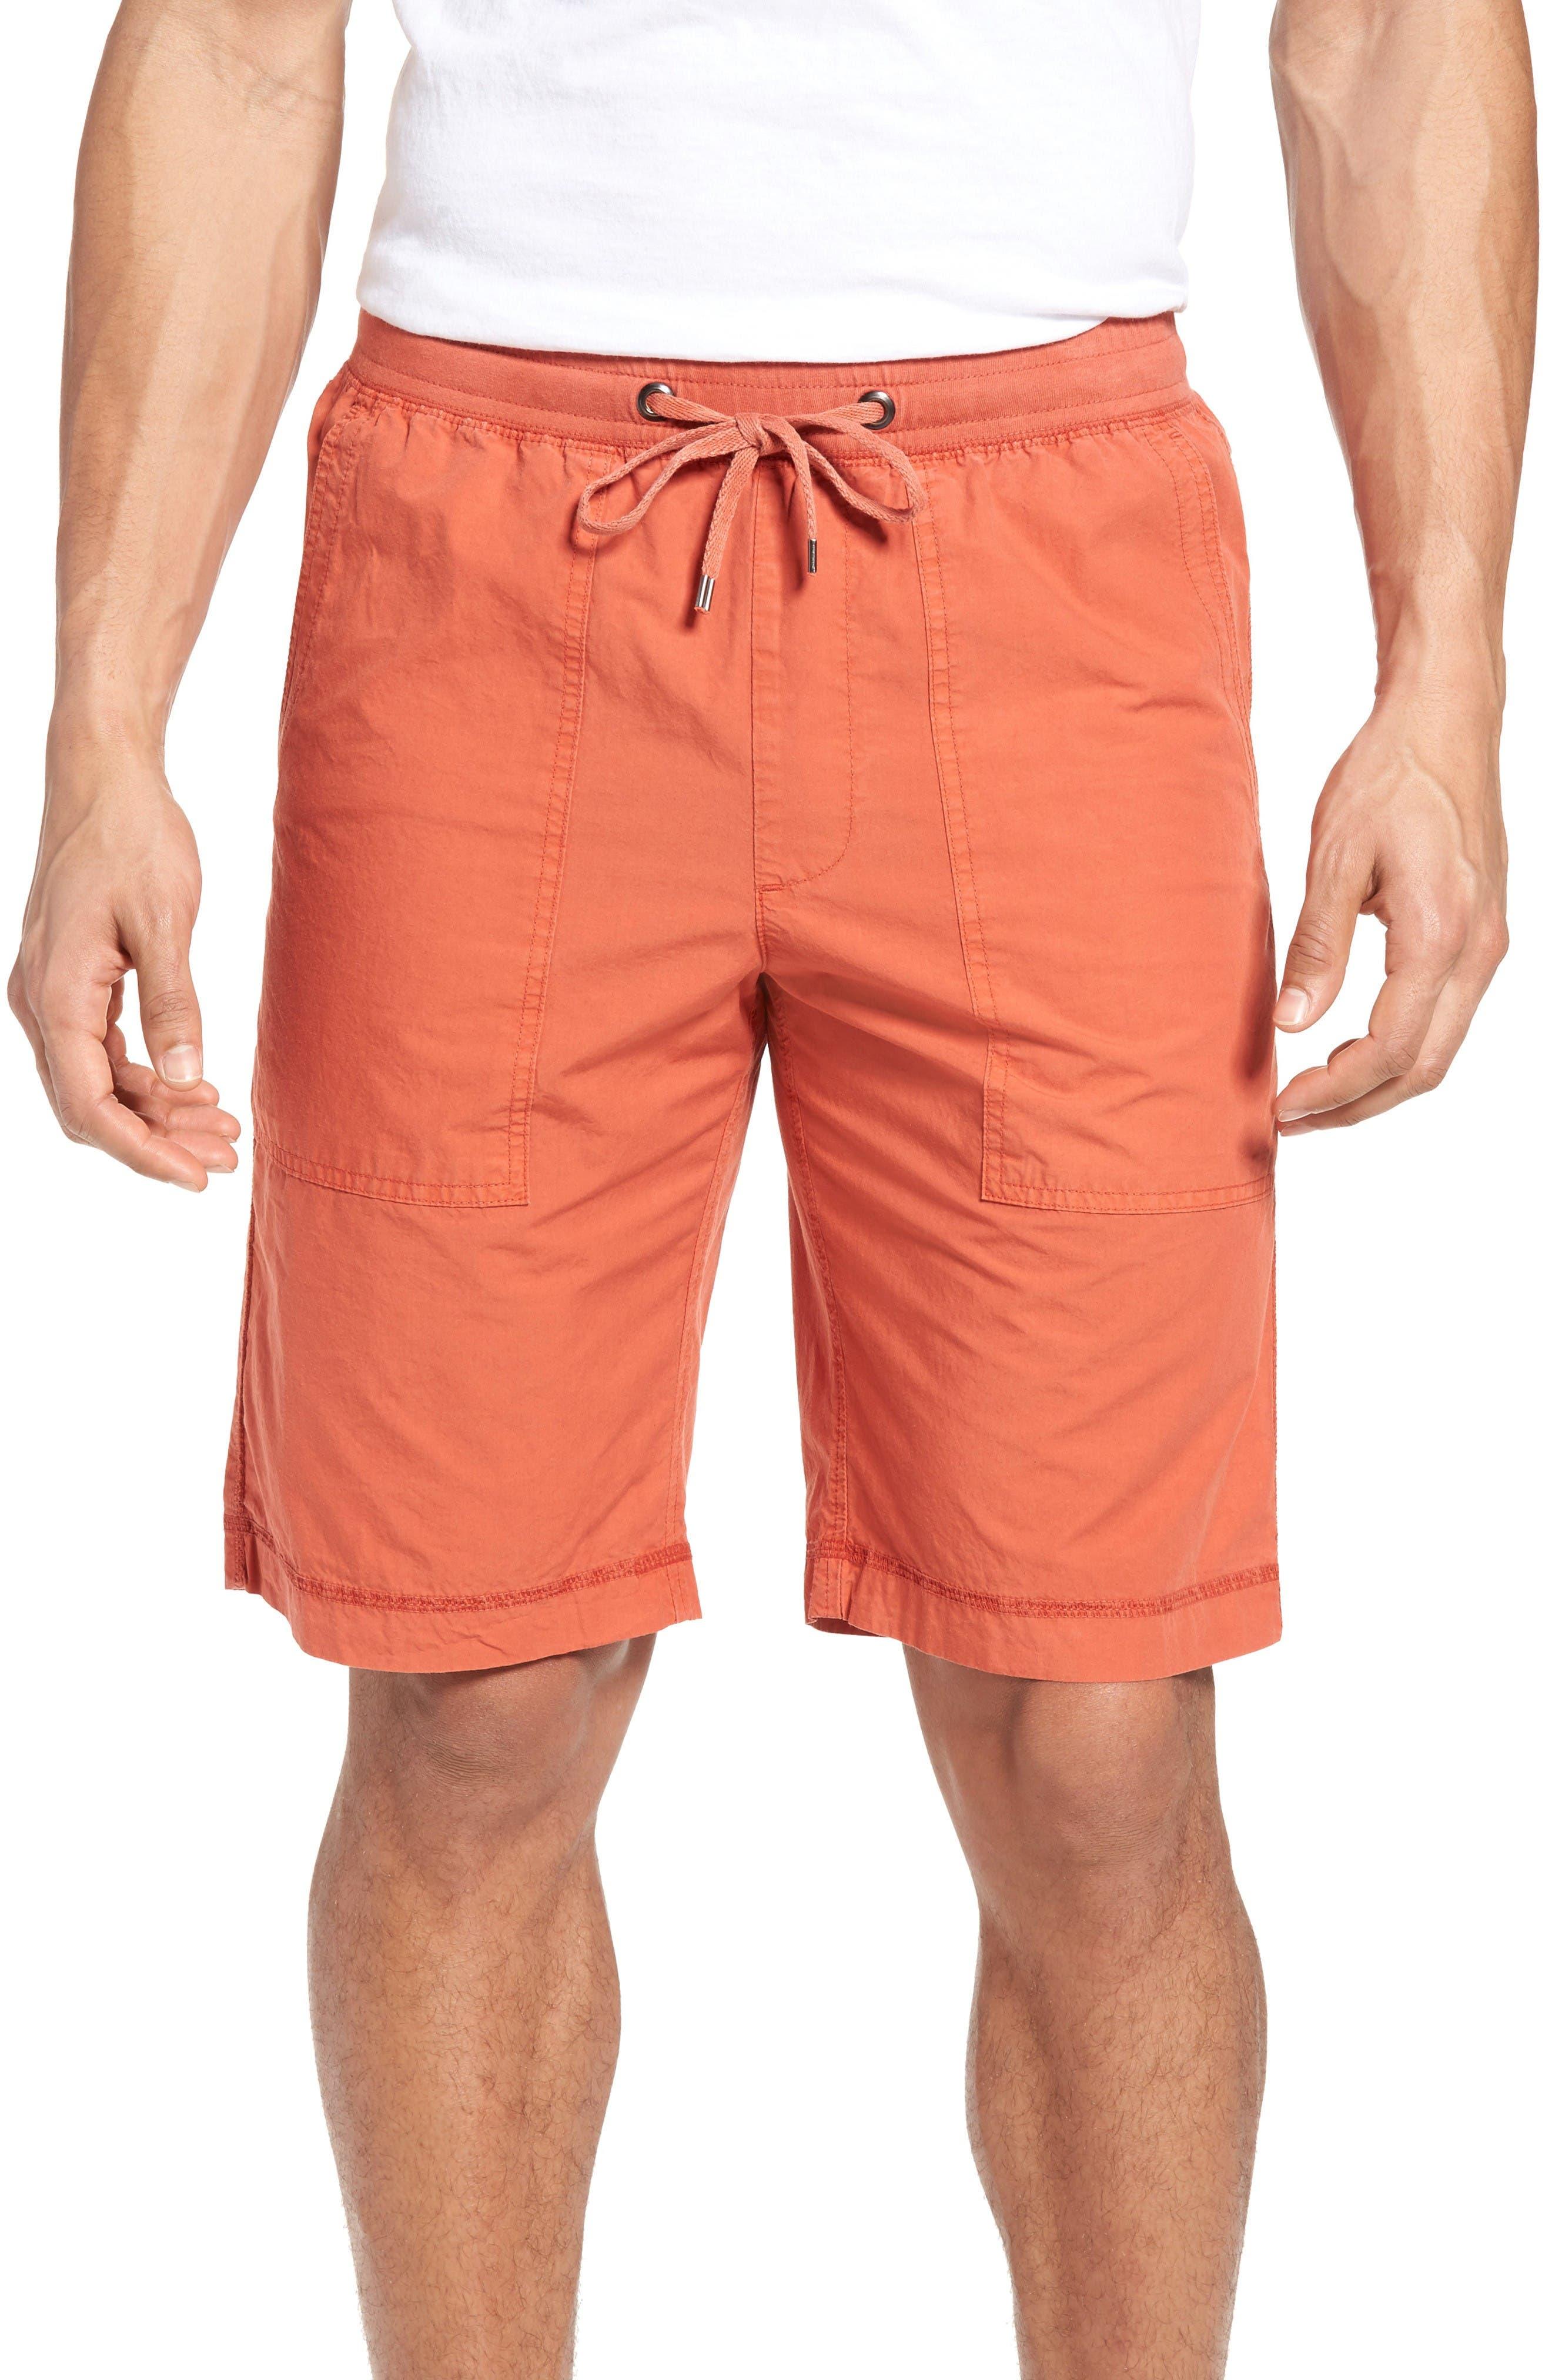 Portside Shorts,                         Main,                         color, Lobster